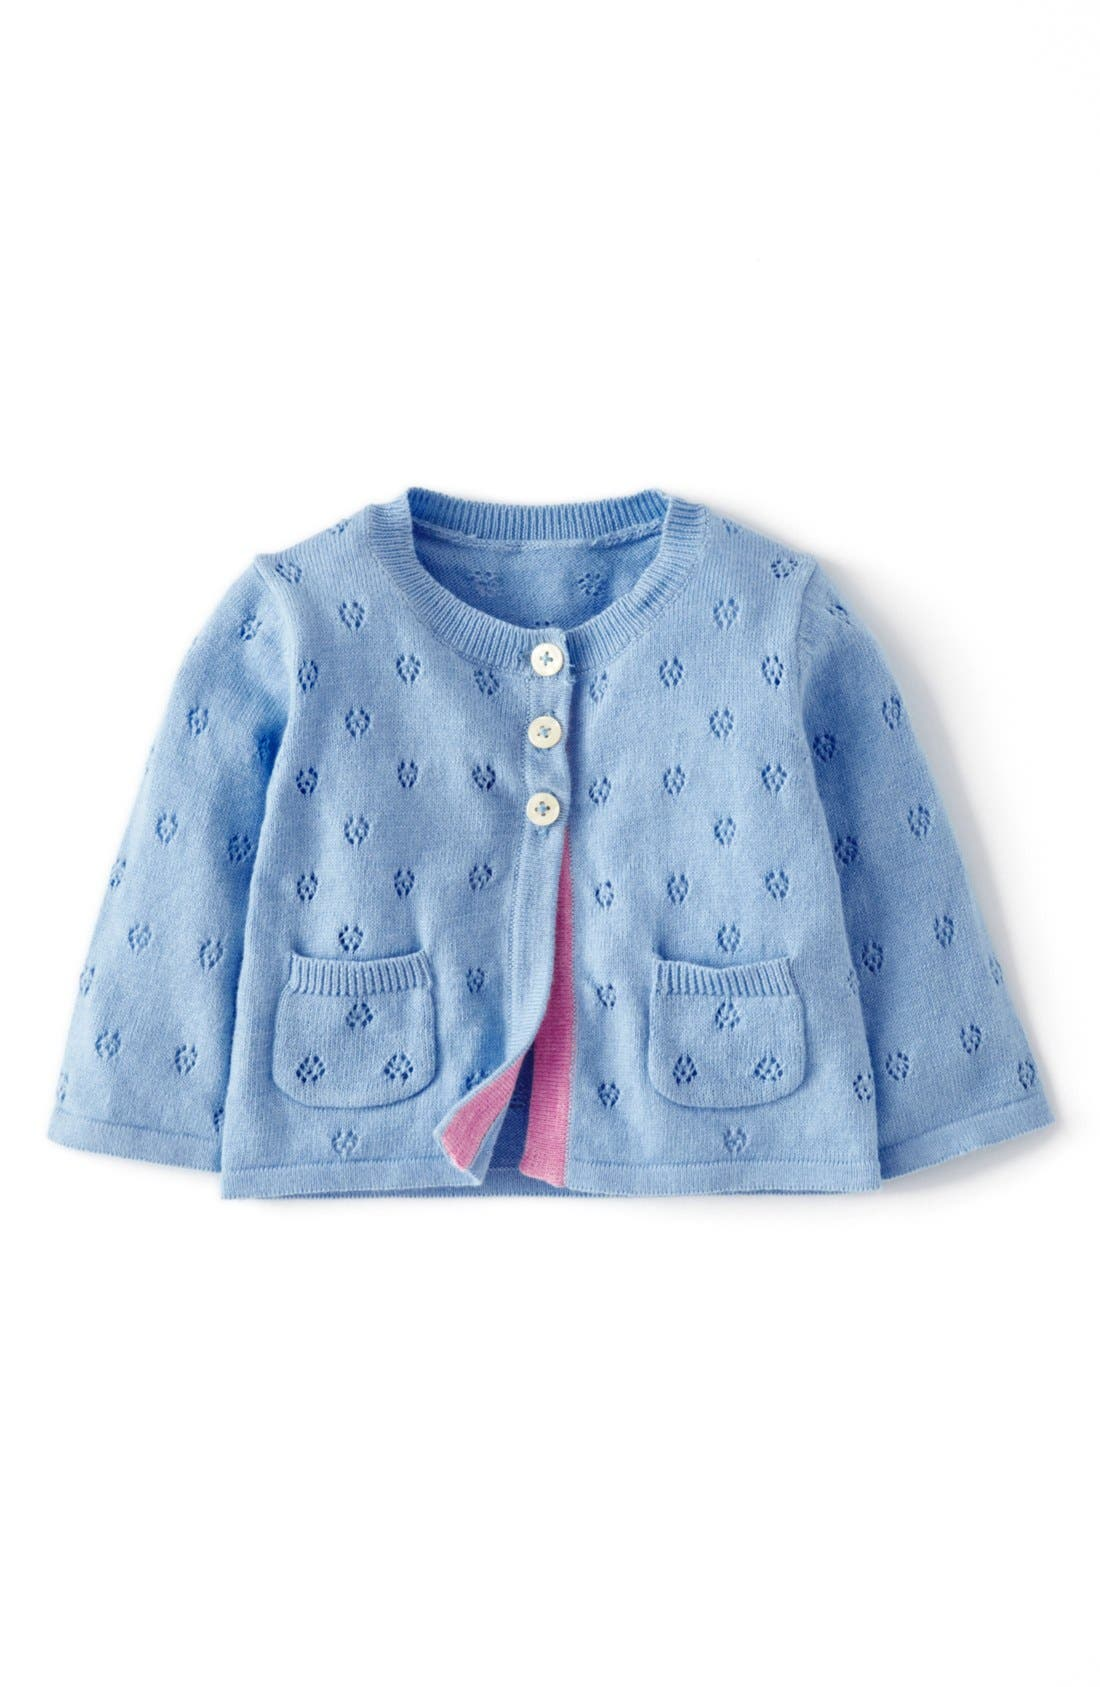 Alternate Image 1 Selected - Mini Boden Pointelle Cardigan (Baby Girls)